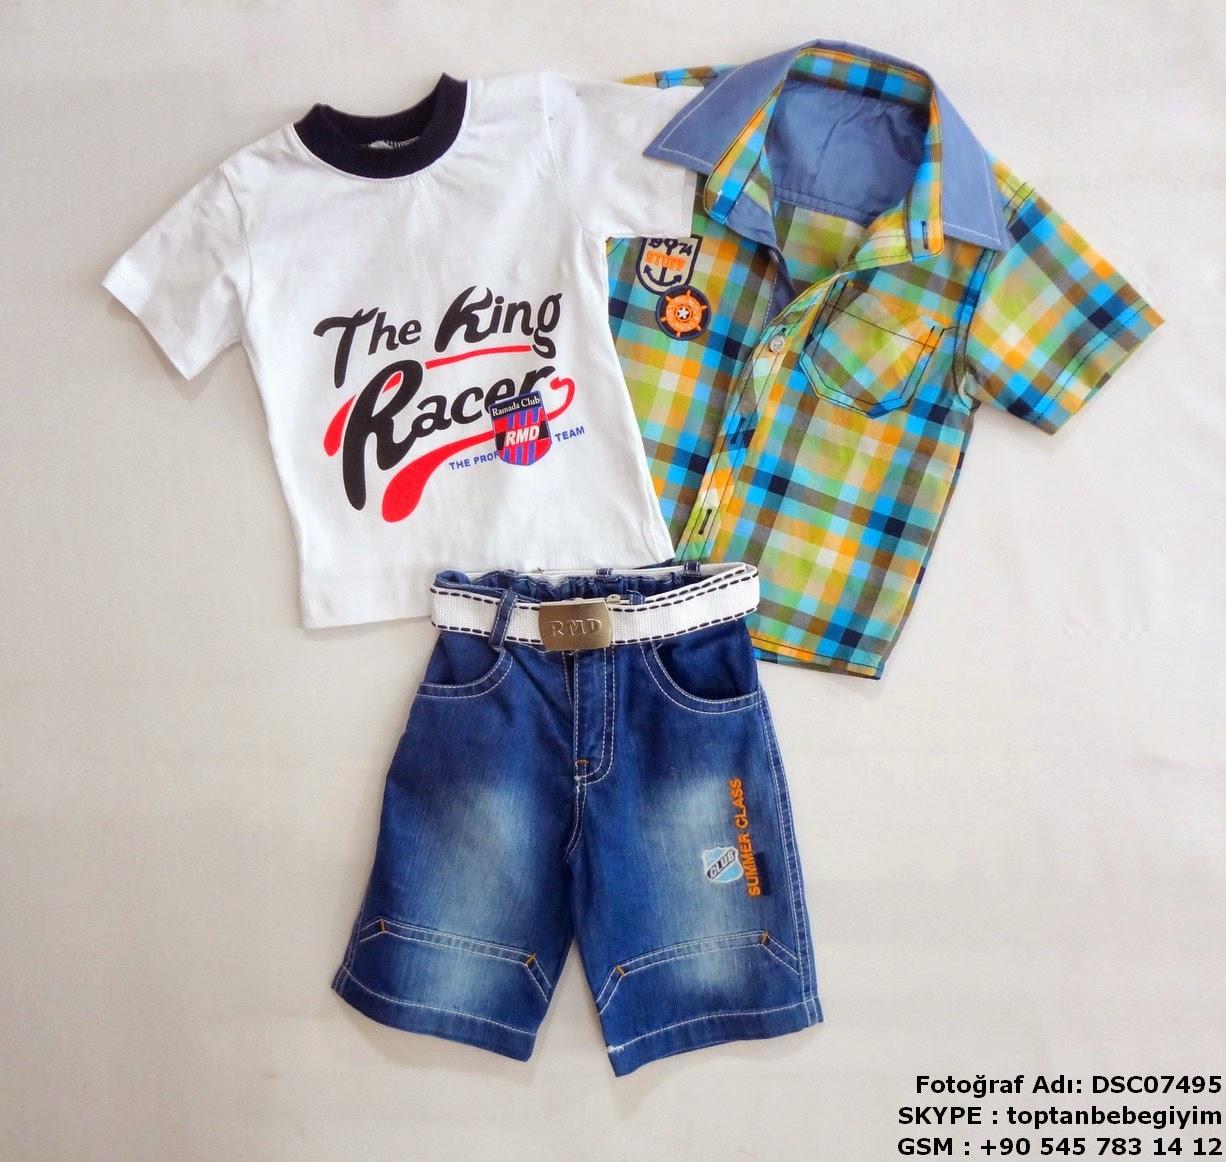 toptan çocuk gömlekli üçlü takımlar tshirt kot set